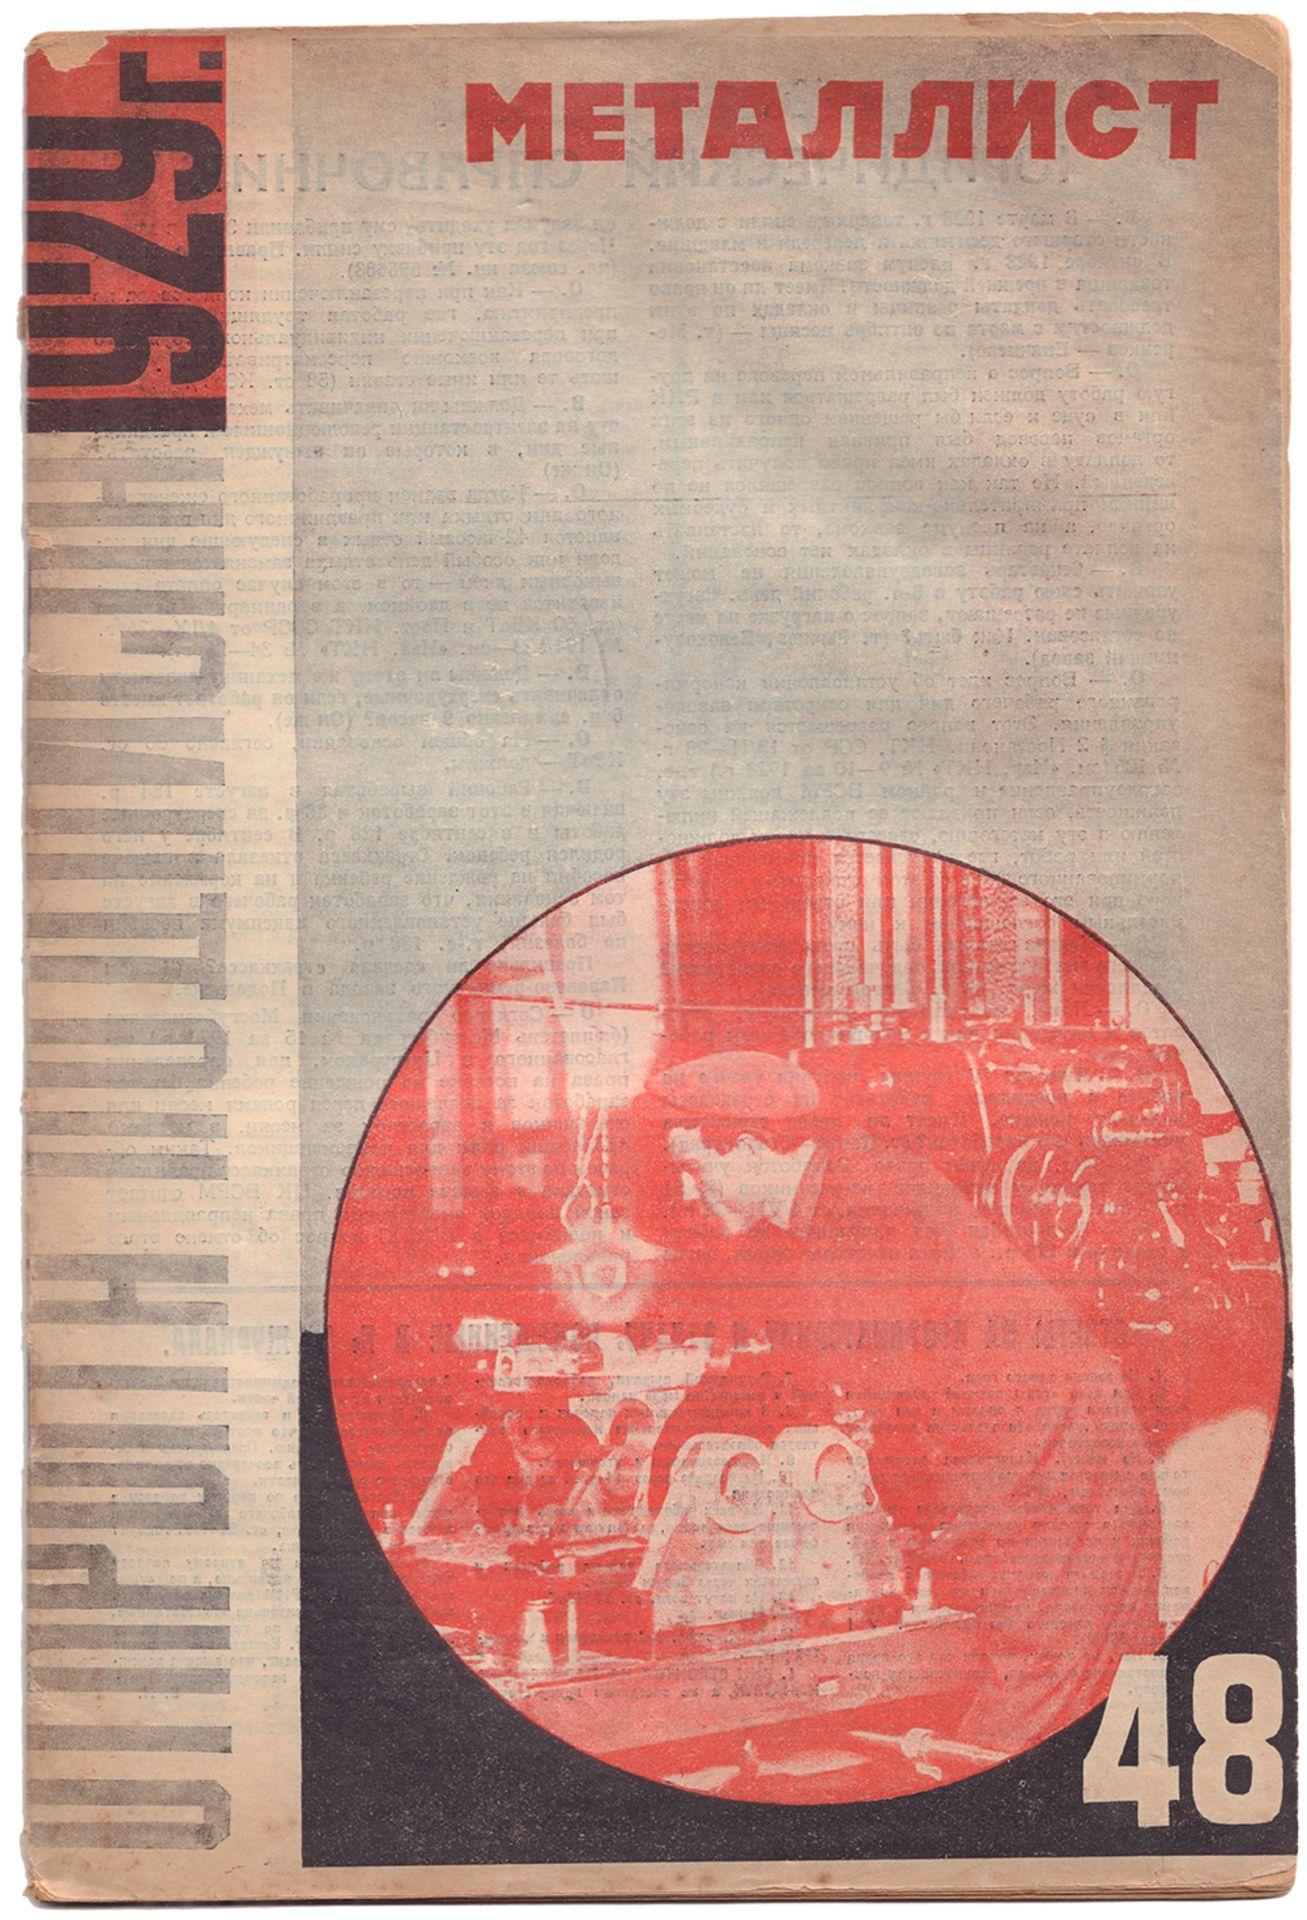 [Soviet art]. Metalworker. Issue 48th. Moscow, 1928. - [1], 32, [1] pp.: ill.; 25,2x7,5 cm.<br>Origi